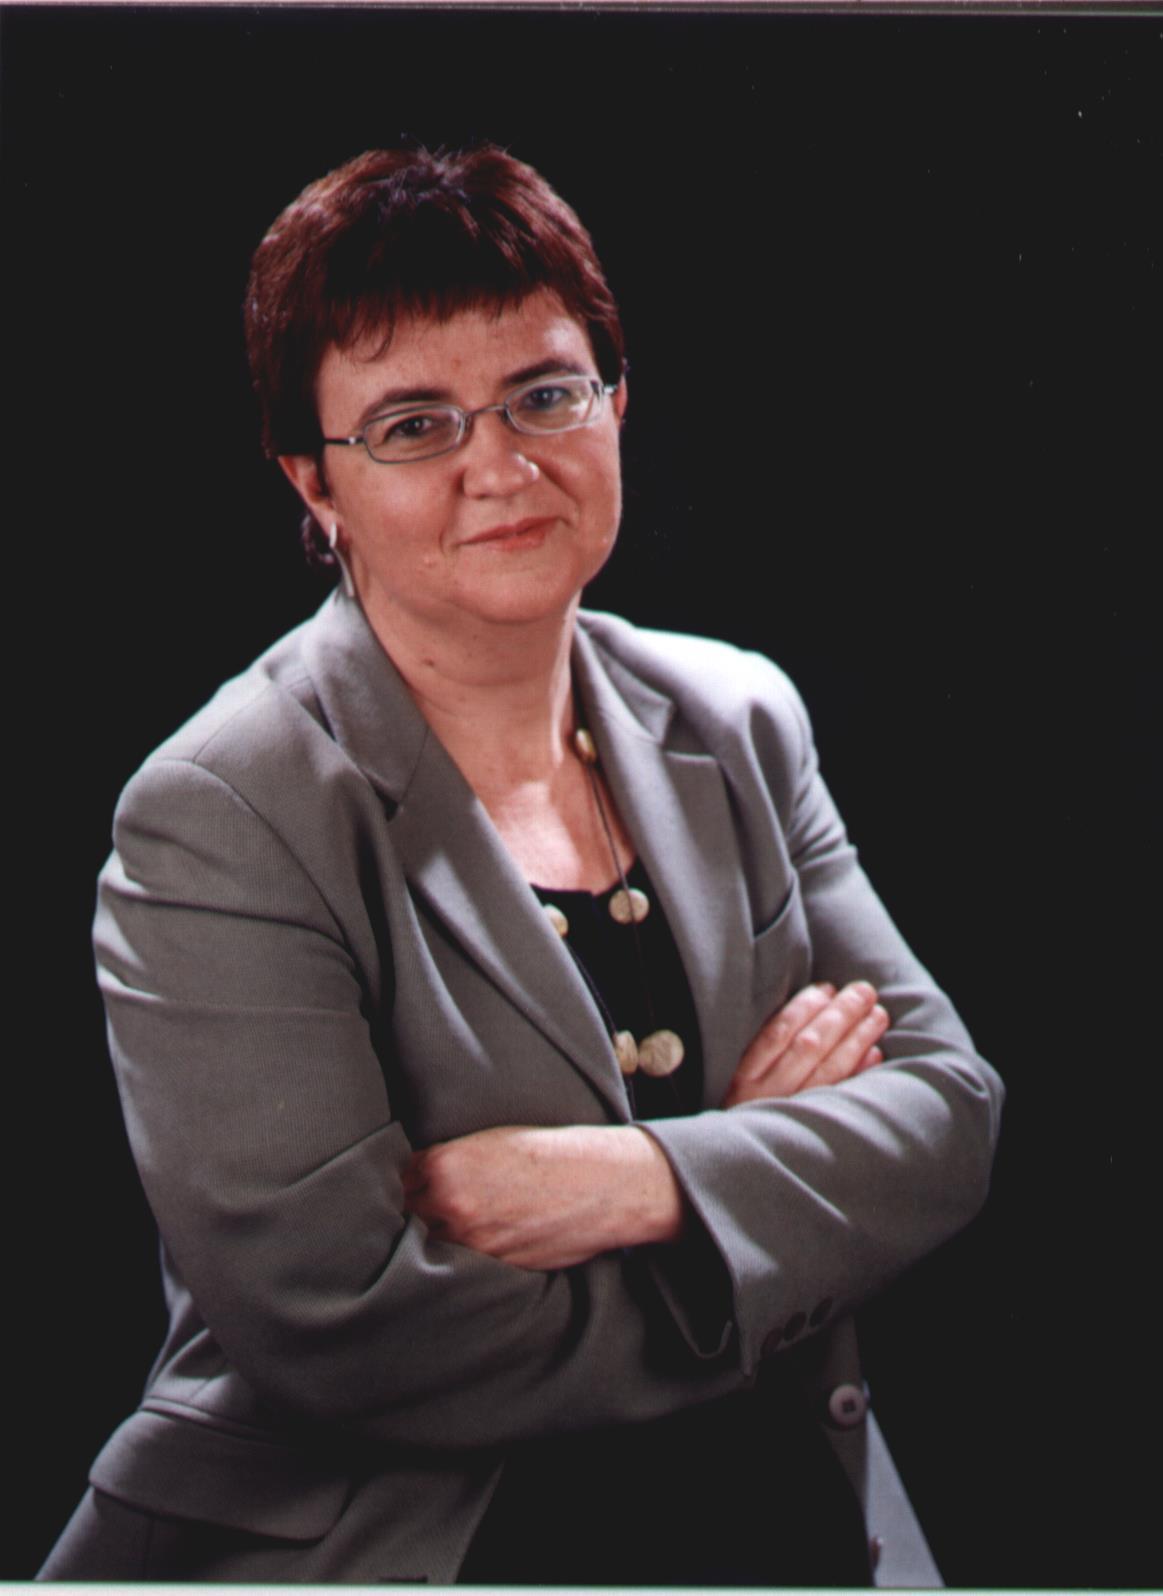 Sra. M. Eulàlia Espinàs